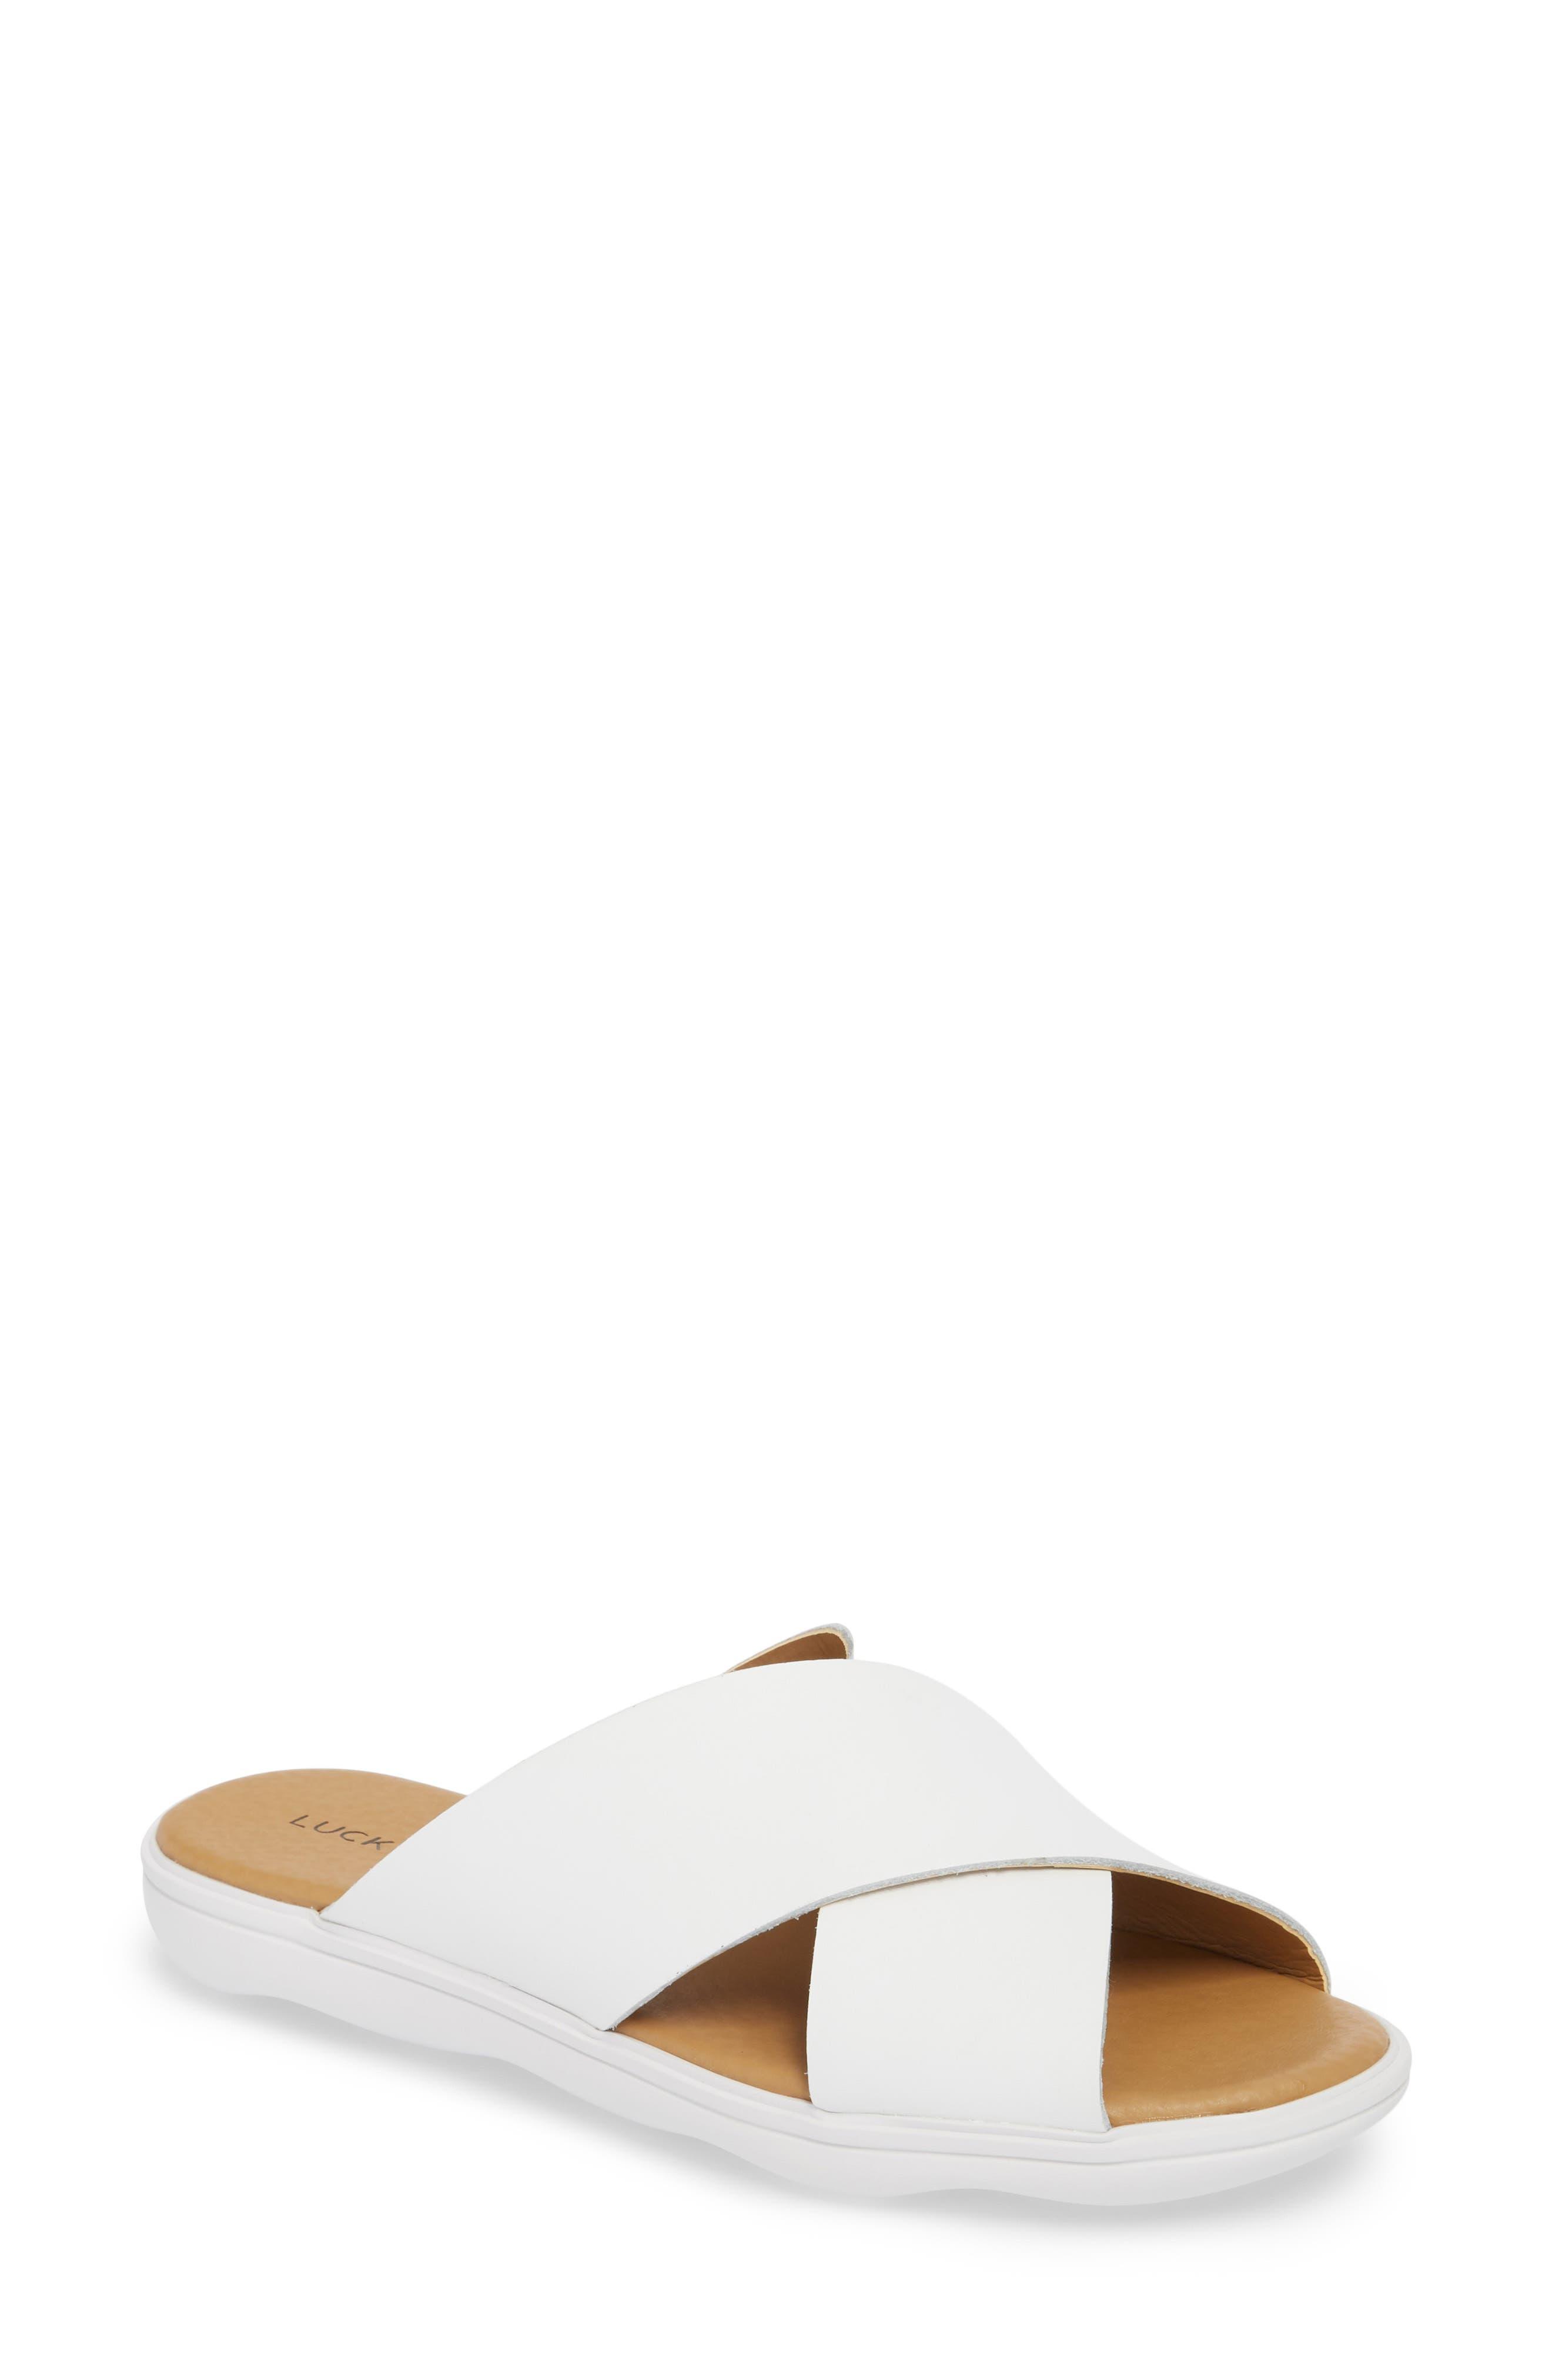 Mahlay Slide Sandal,                         Main,                         color, Optic White Leather